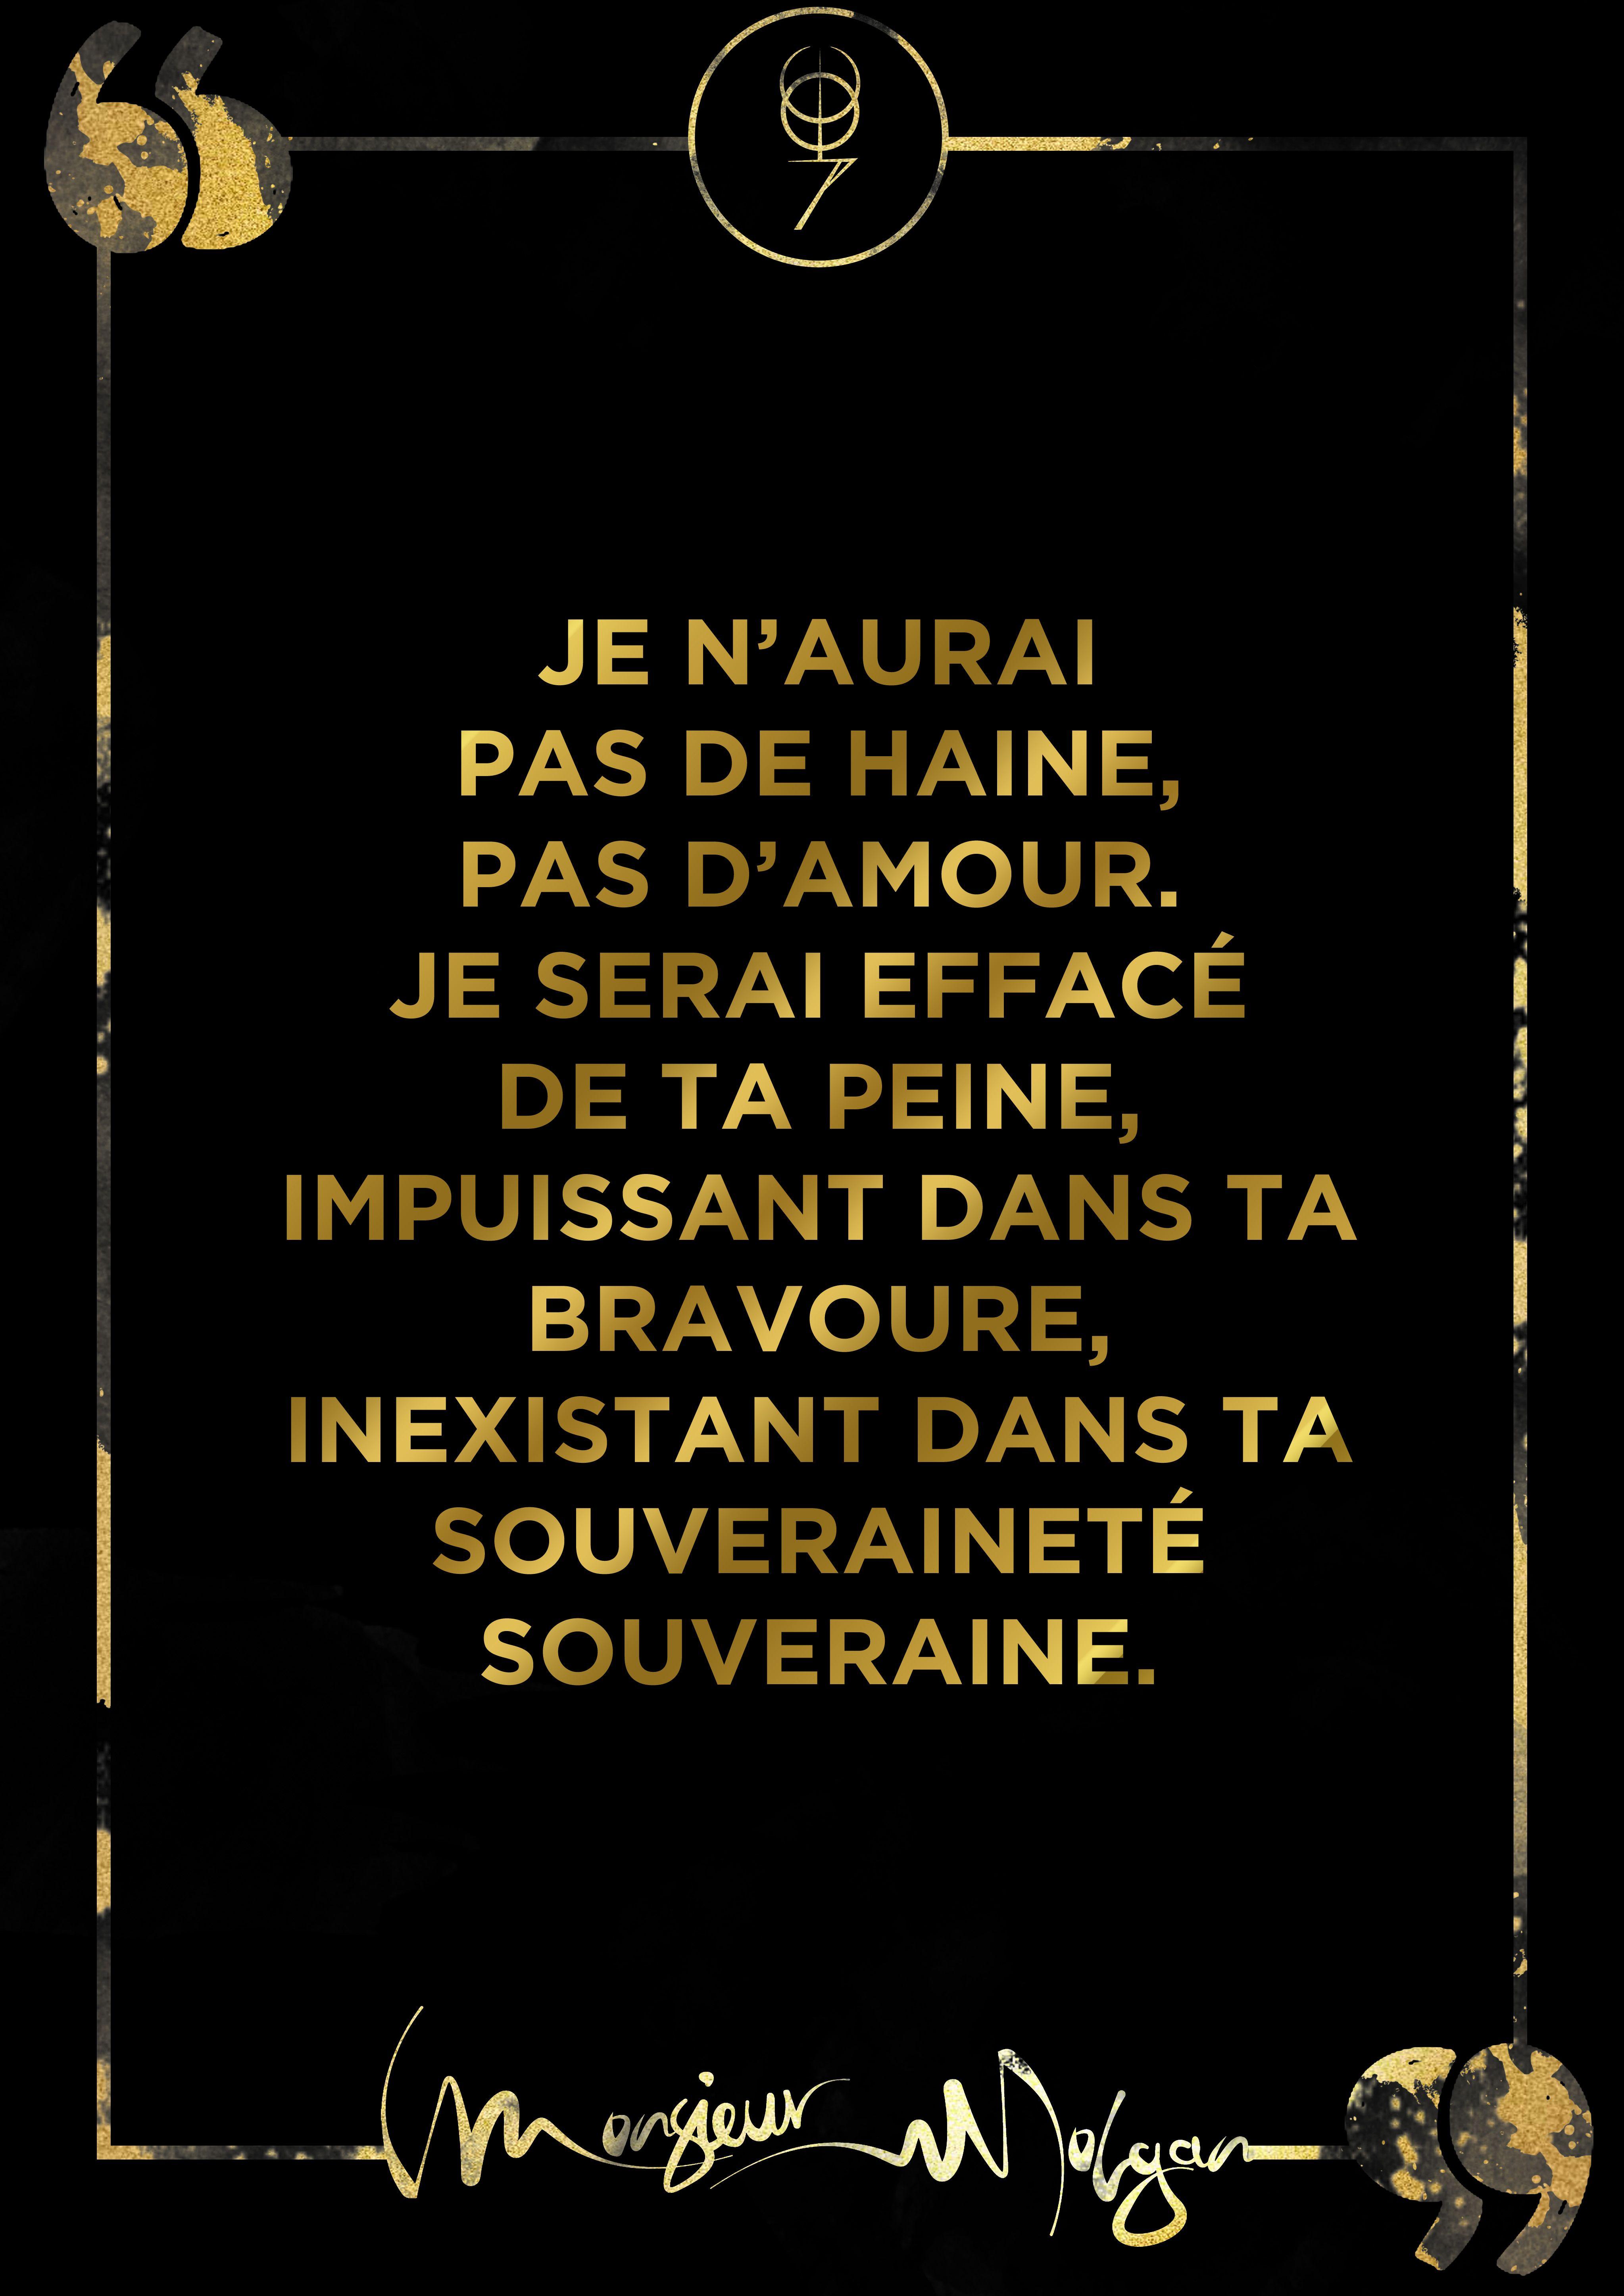 Monsieur Wolgan France French Français Amour Fashion